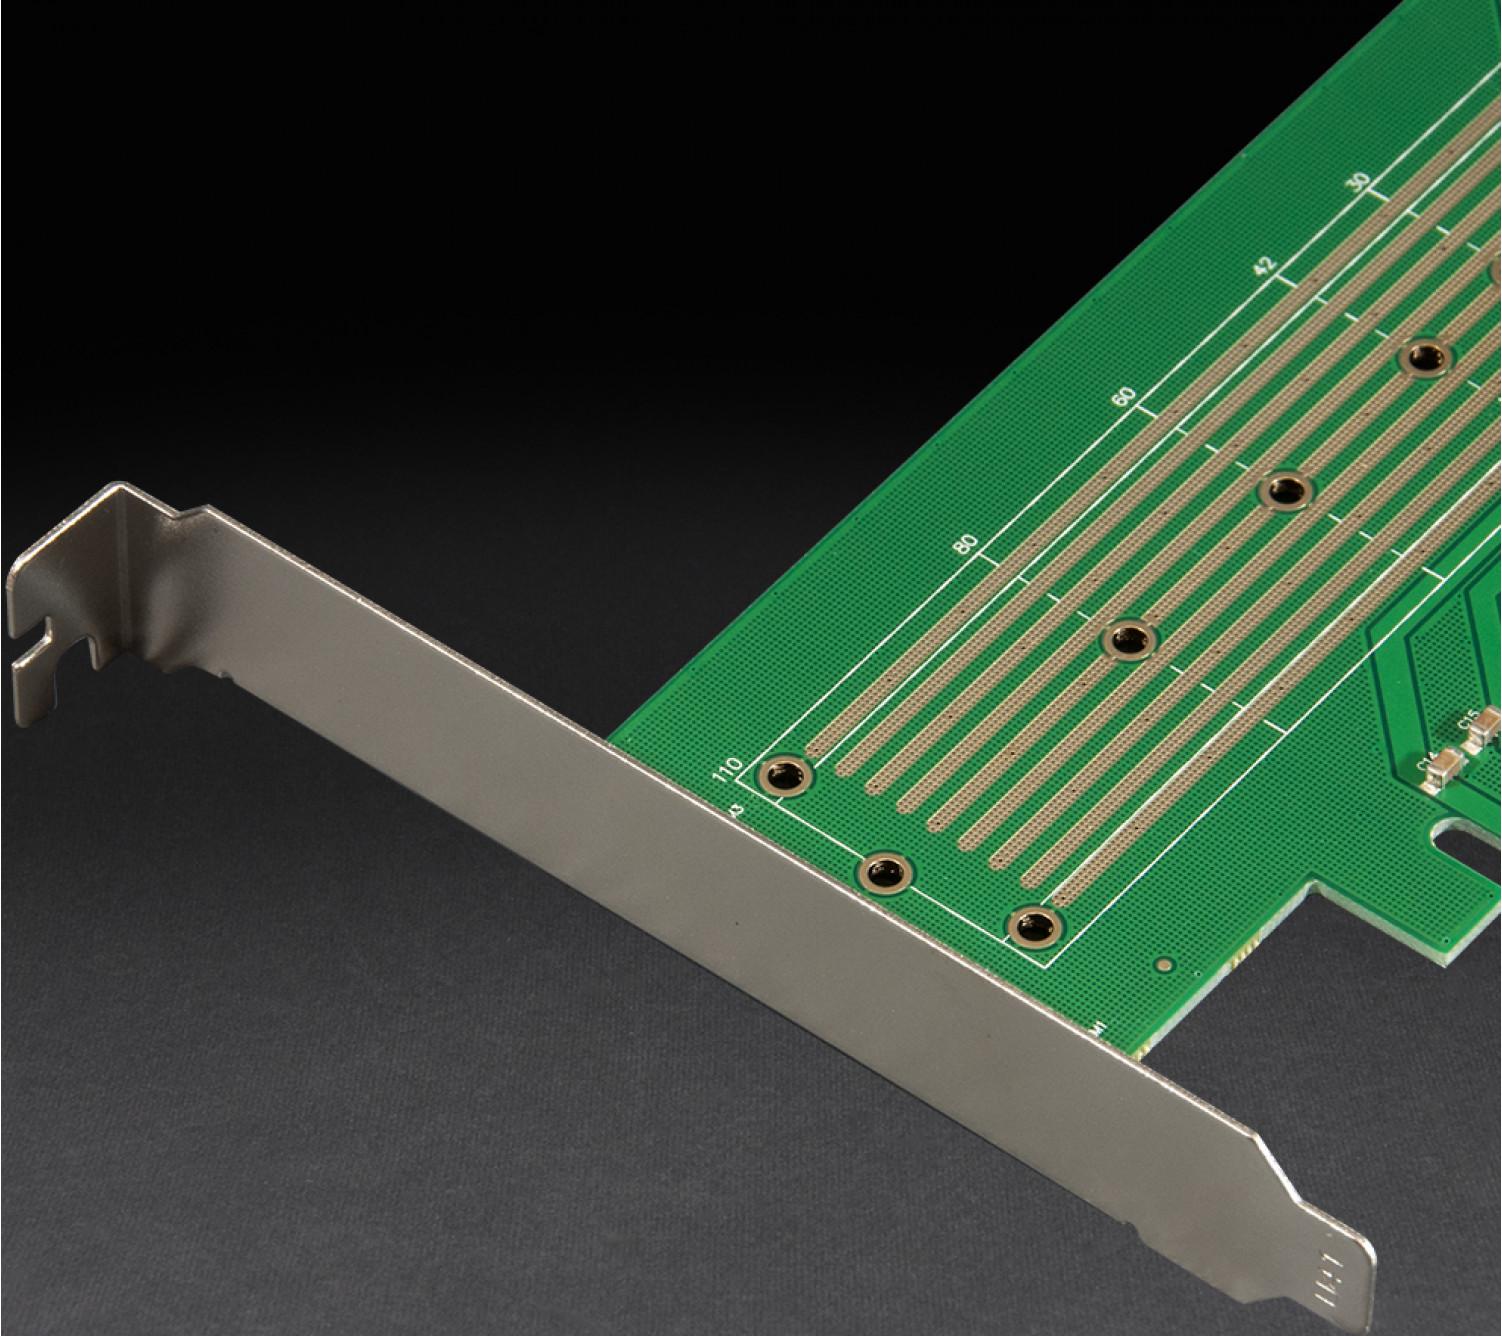 Адаптер Frime PCI-E x4/x8/x16 to M.2 (M Key) NVMe